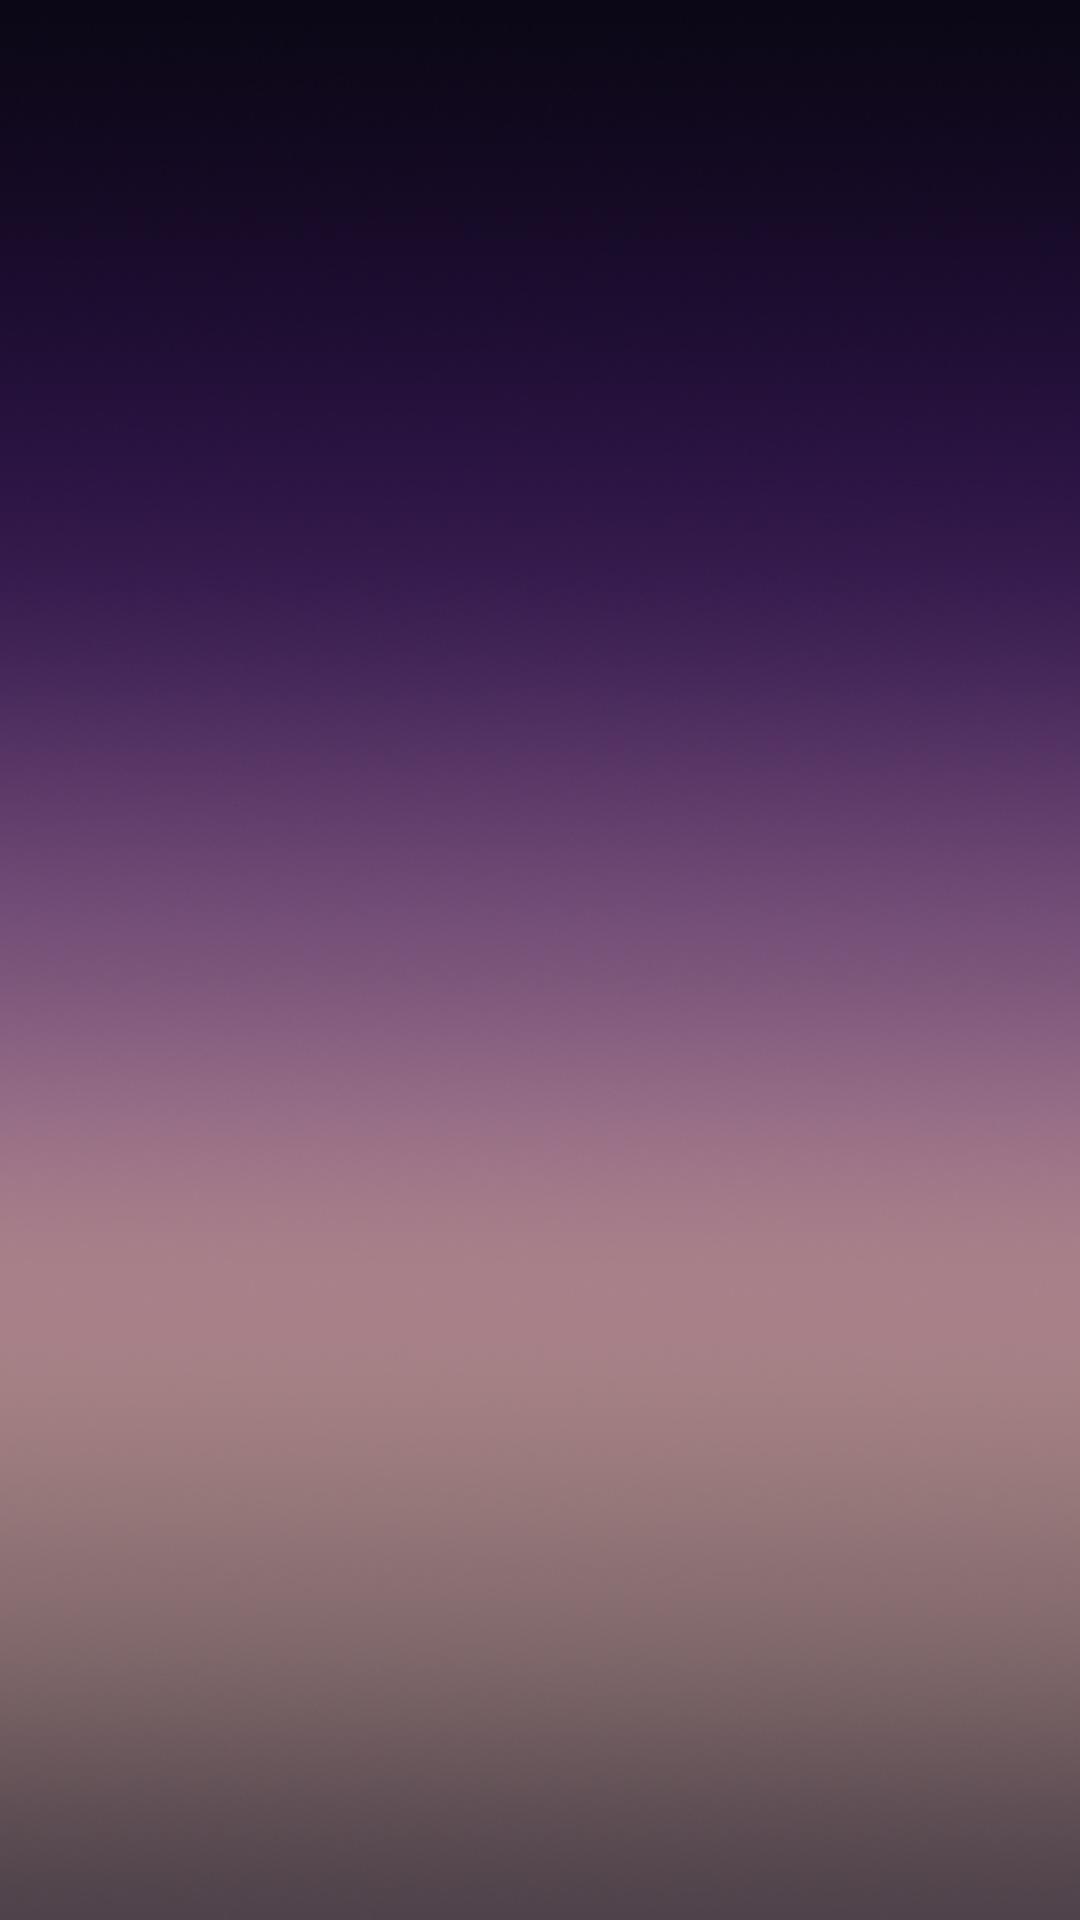 Mauve Wallpaper Galaxy Clean Beauty Colour Peaceful Calming Abstract Digital Ar Fondos De Colores Fondos De Pantalla Morados Fondo De Pantalla Samsung